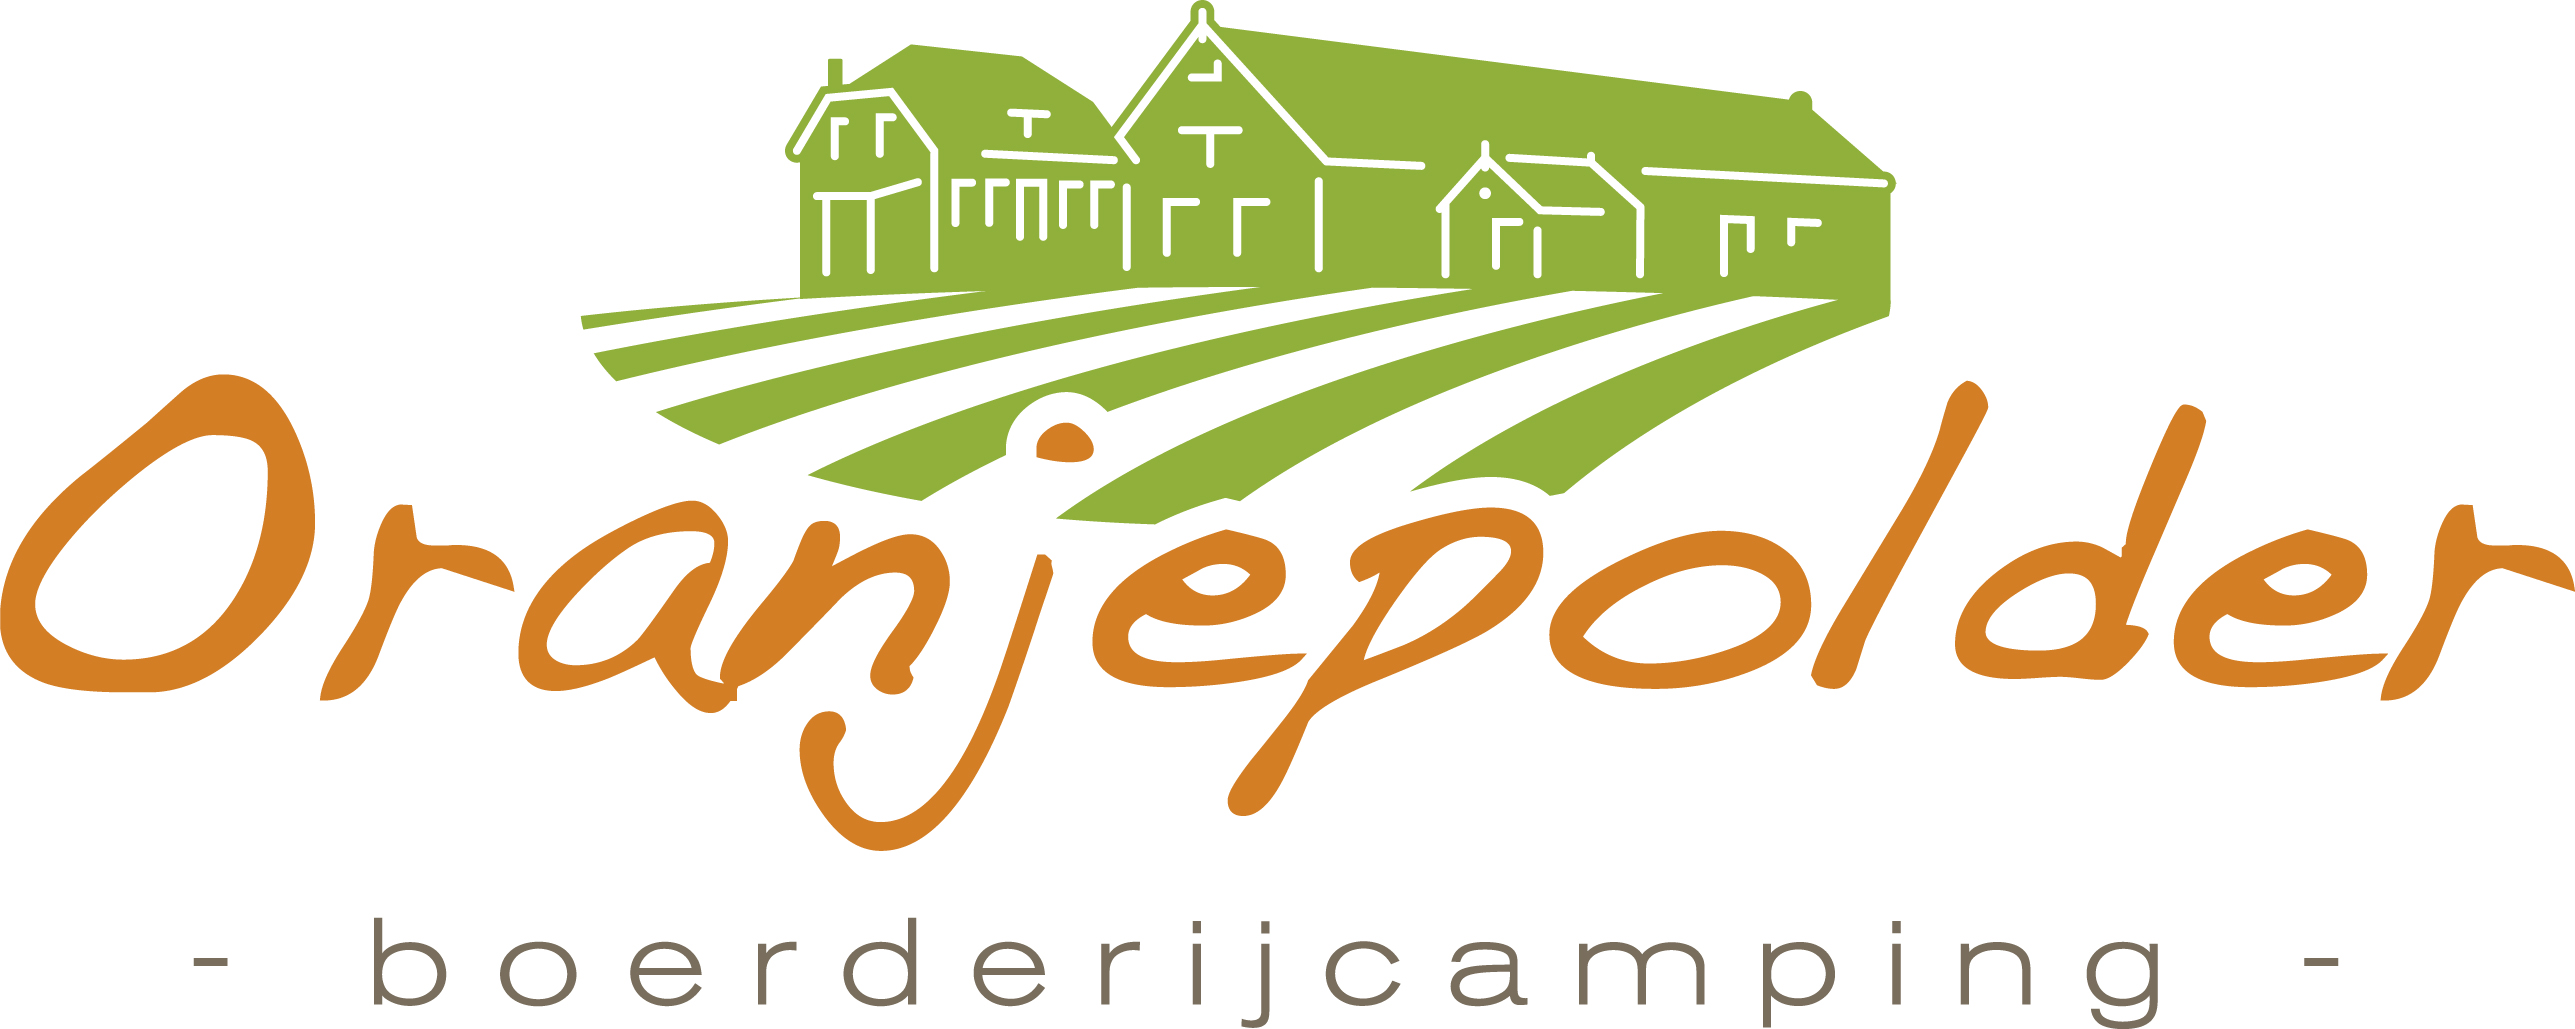 Boerderijcamping Oranjepolder